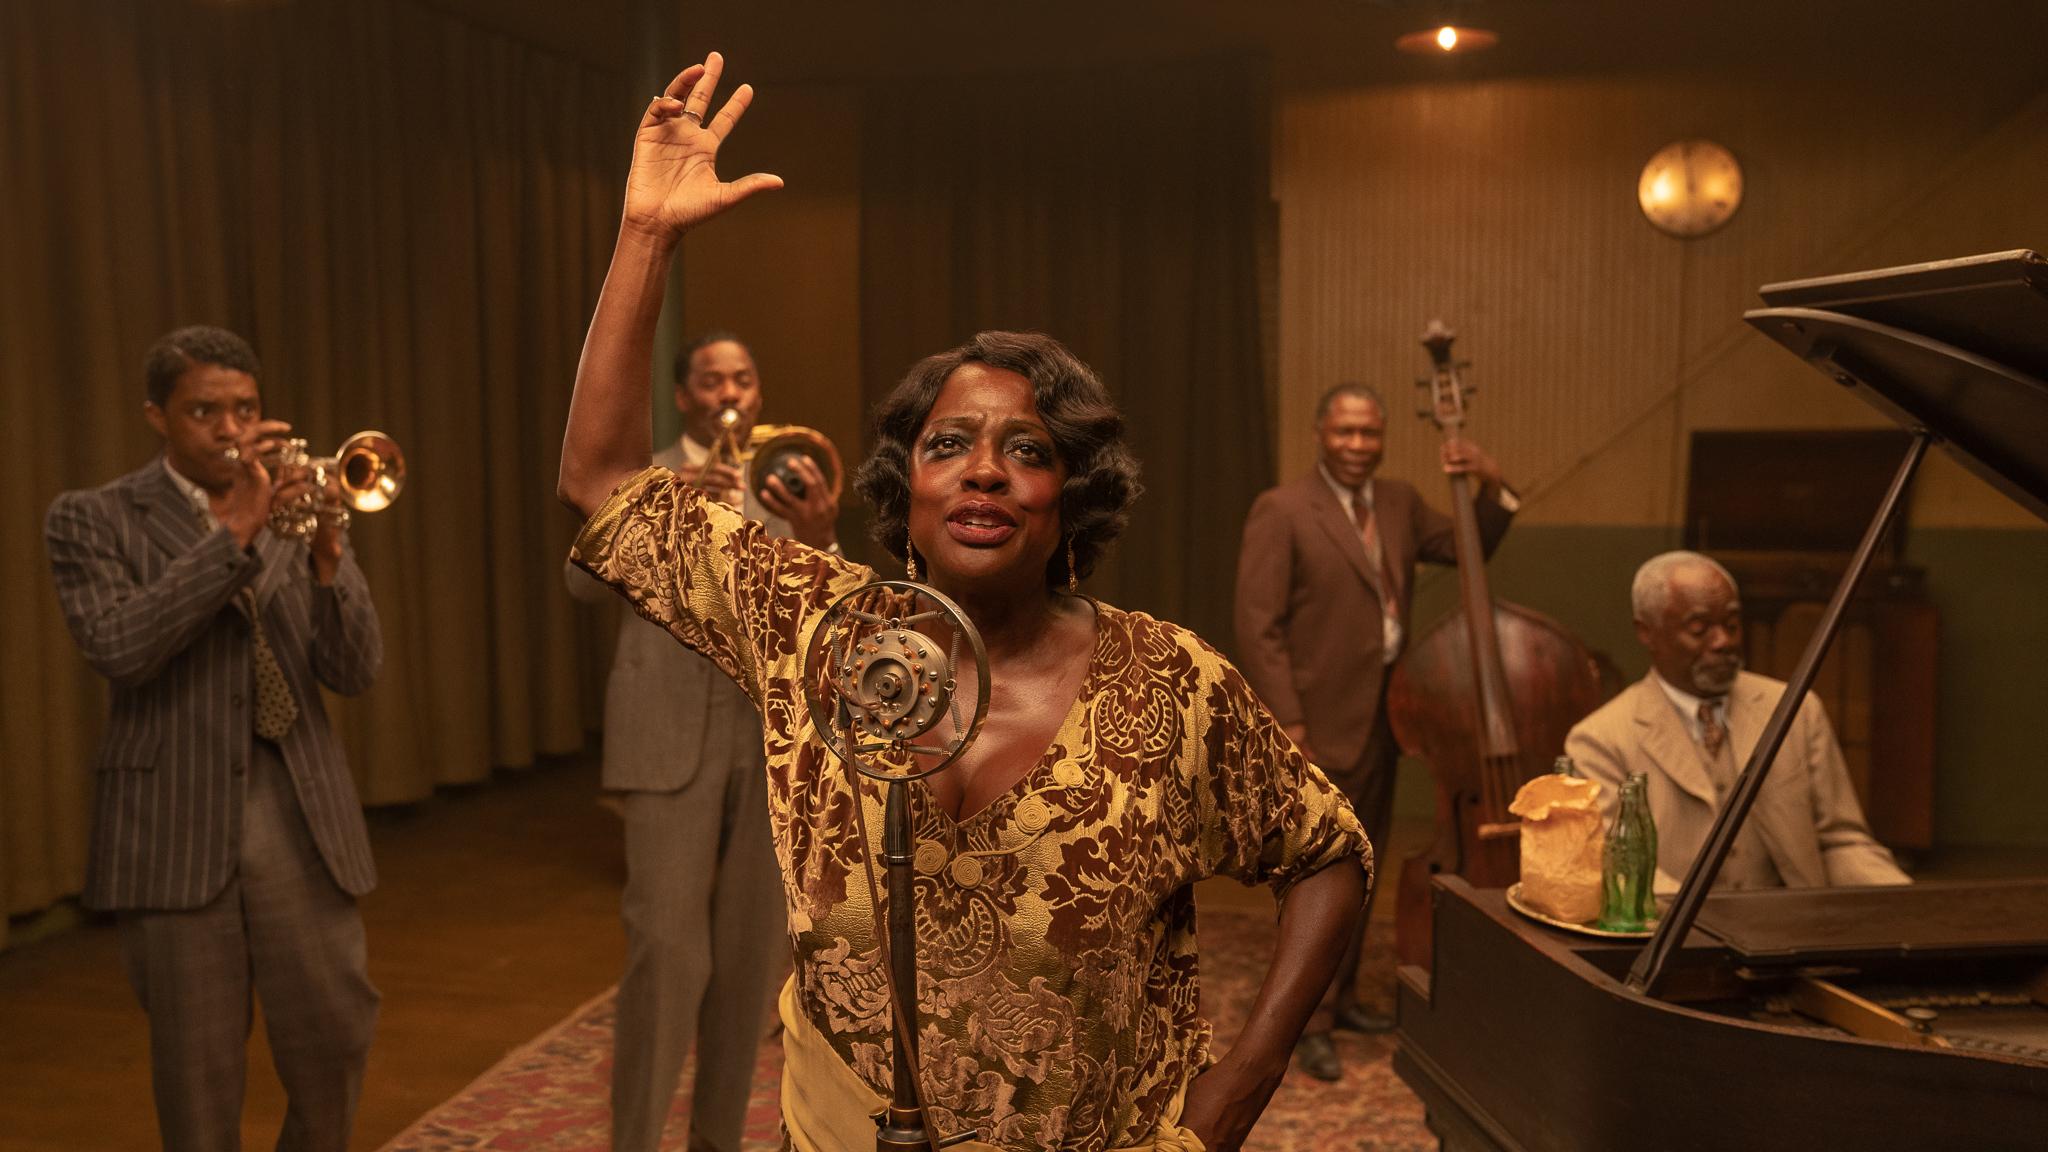 Netflix revela el primer vistazo a Ma Rainey's Black Bottom, última película de Chadwick Boseman